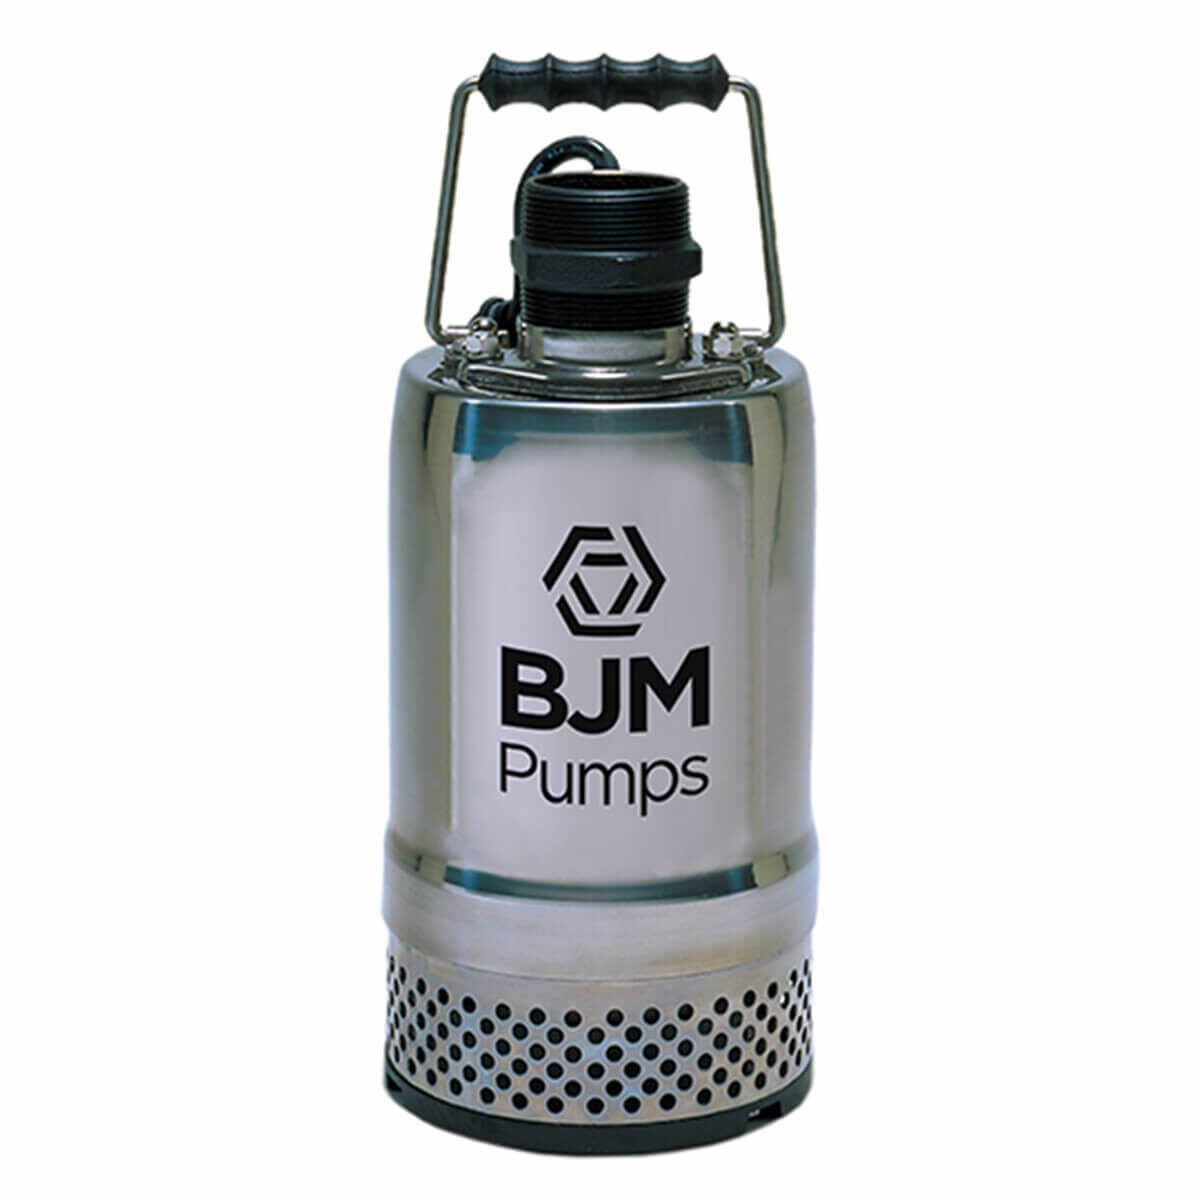 BJM R400-115 2 inch Submersible Pump